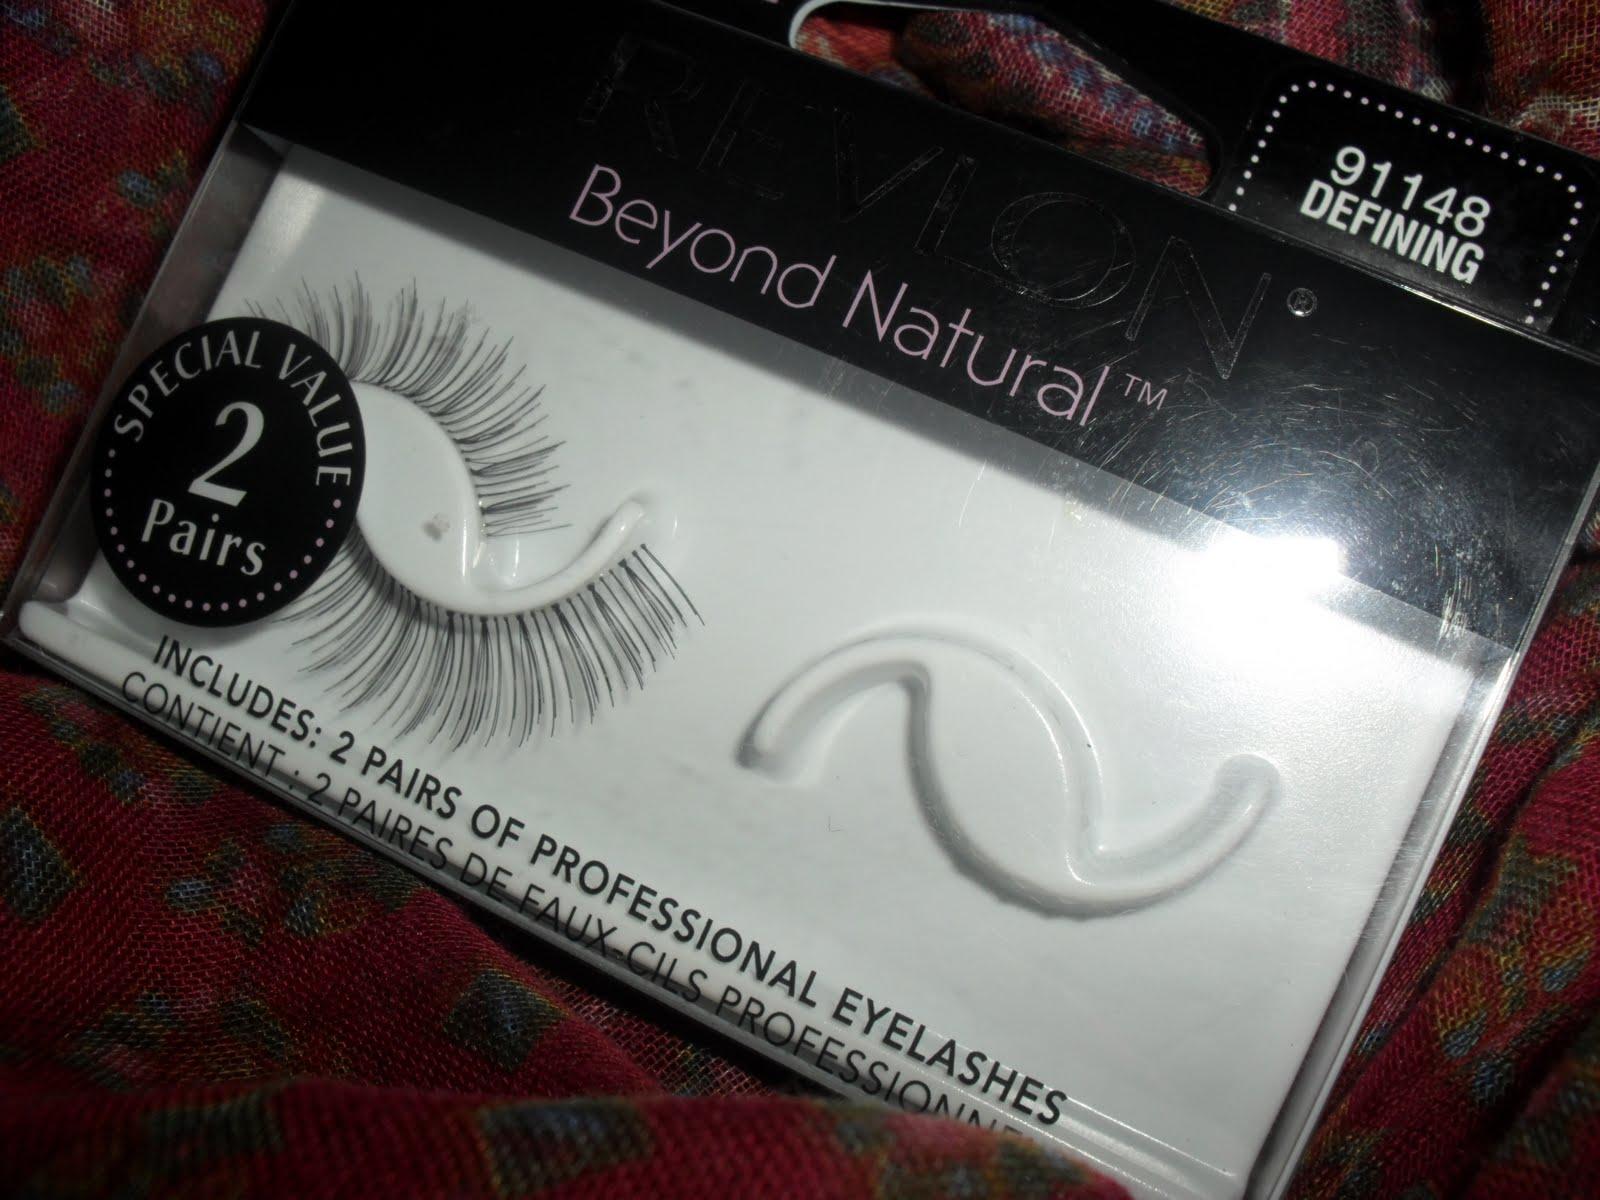 Revlon Beyond Natural Lashes Defining Pretty Giddy Lifestyle